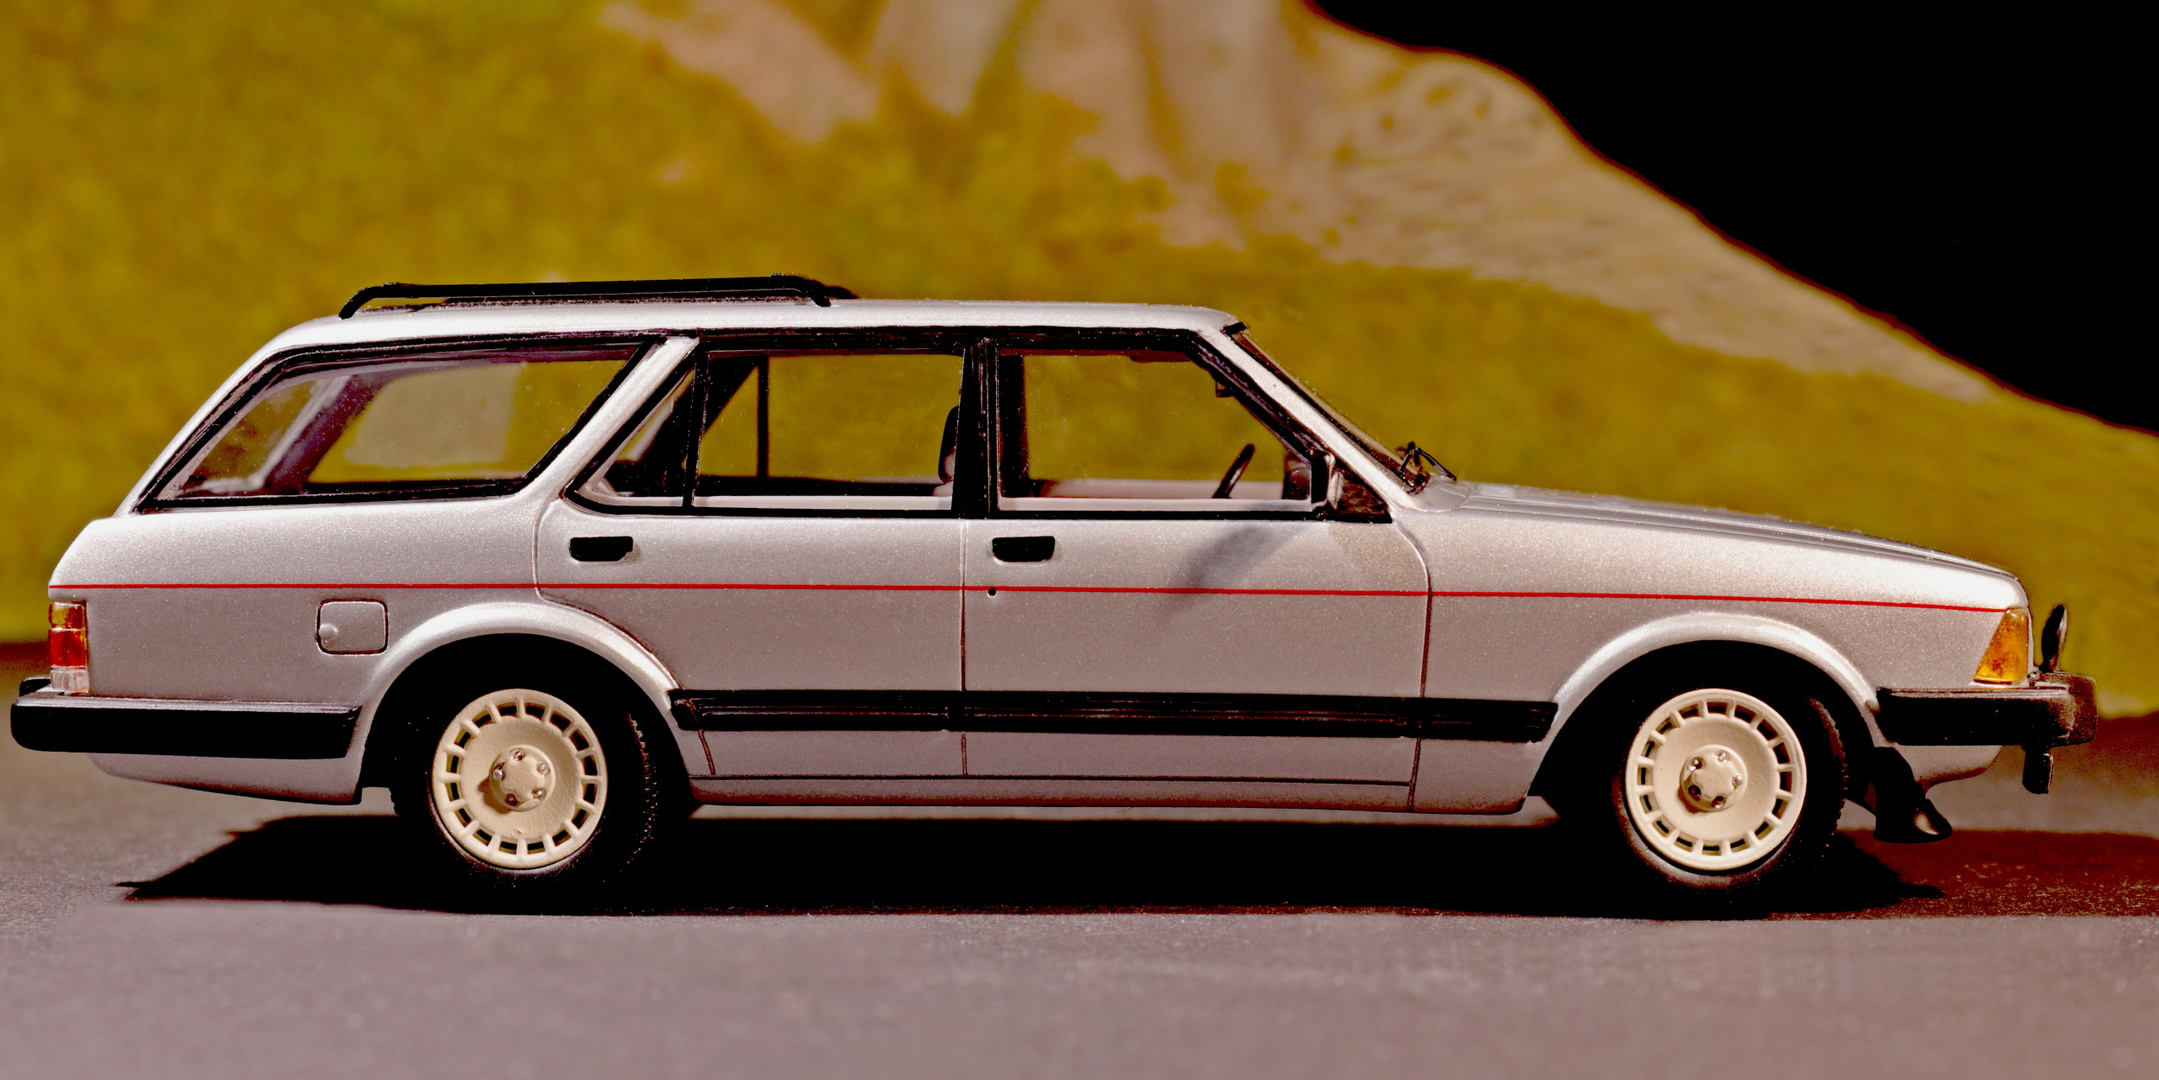 Ford Granada 2.8 i Sport Turnier